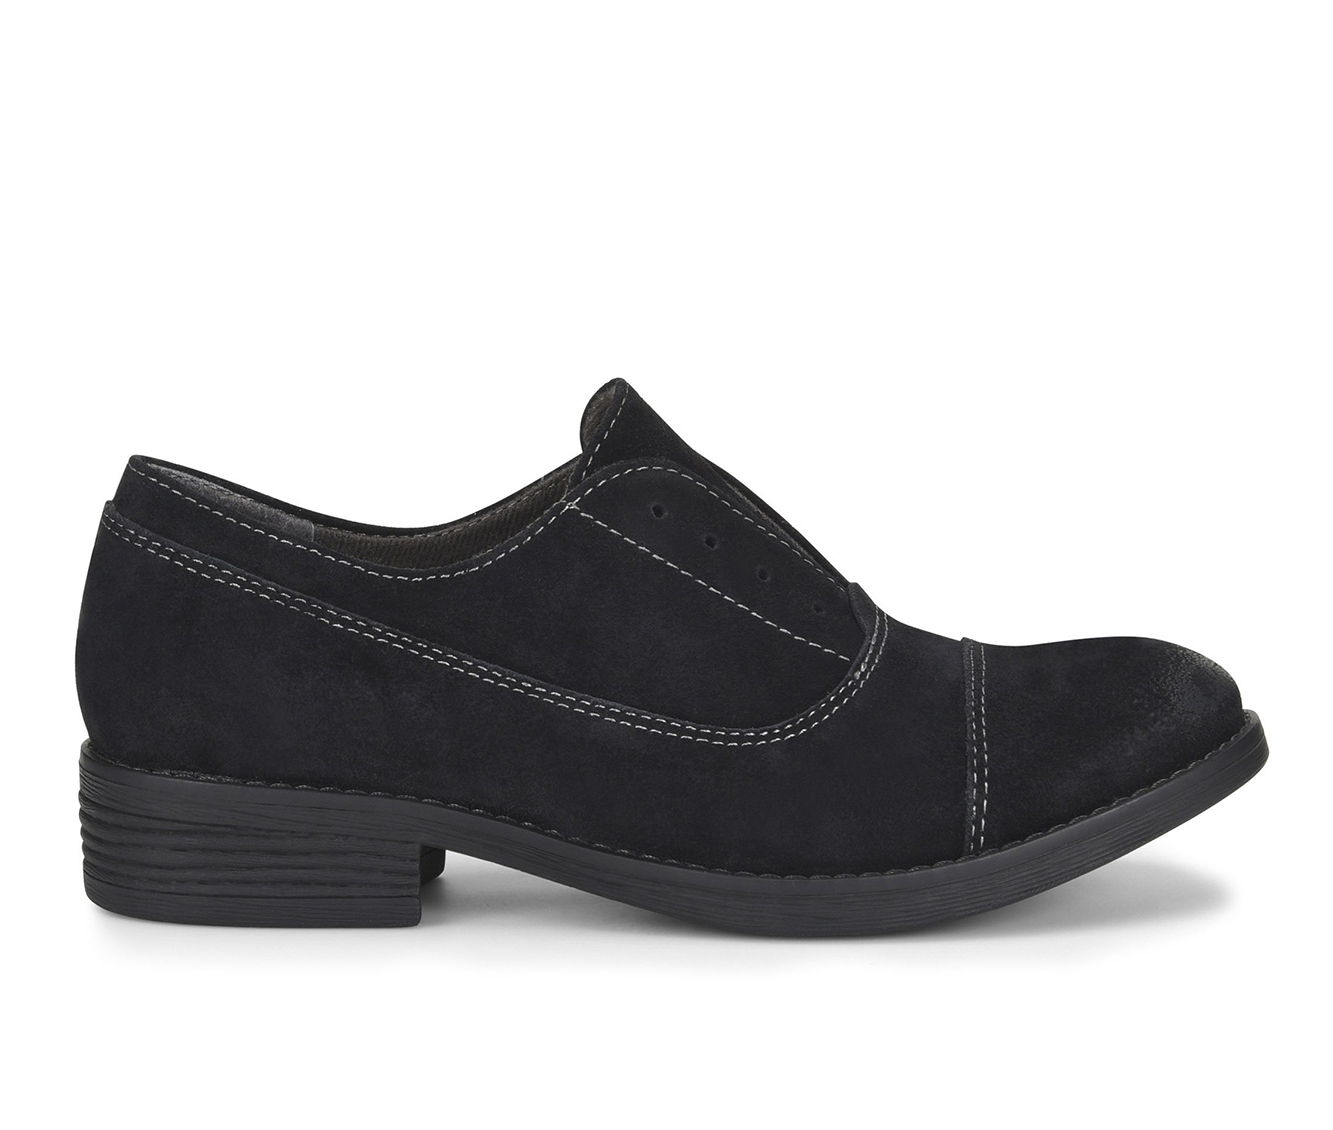 EuroSoft Tanya Women's Shoe (Black Suede)